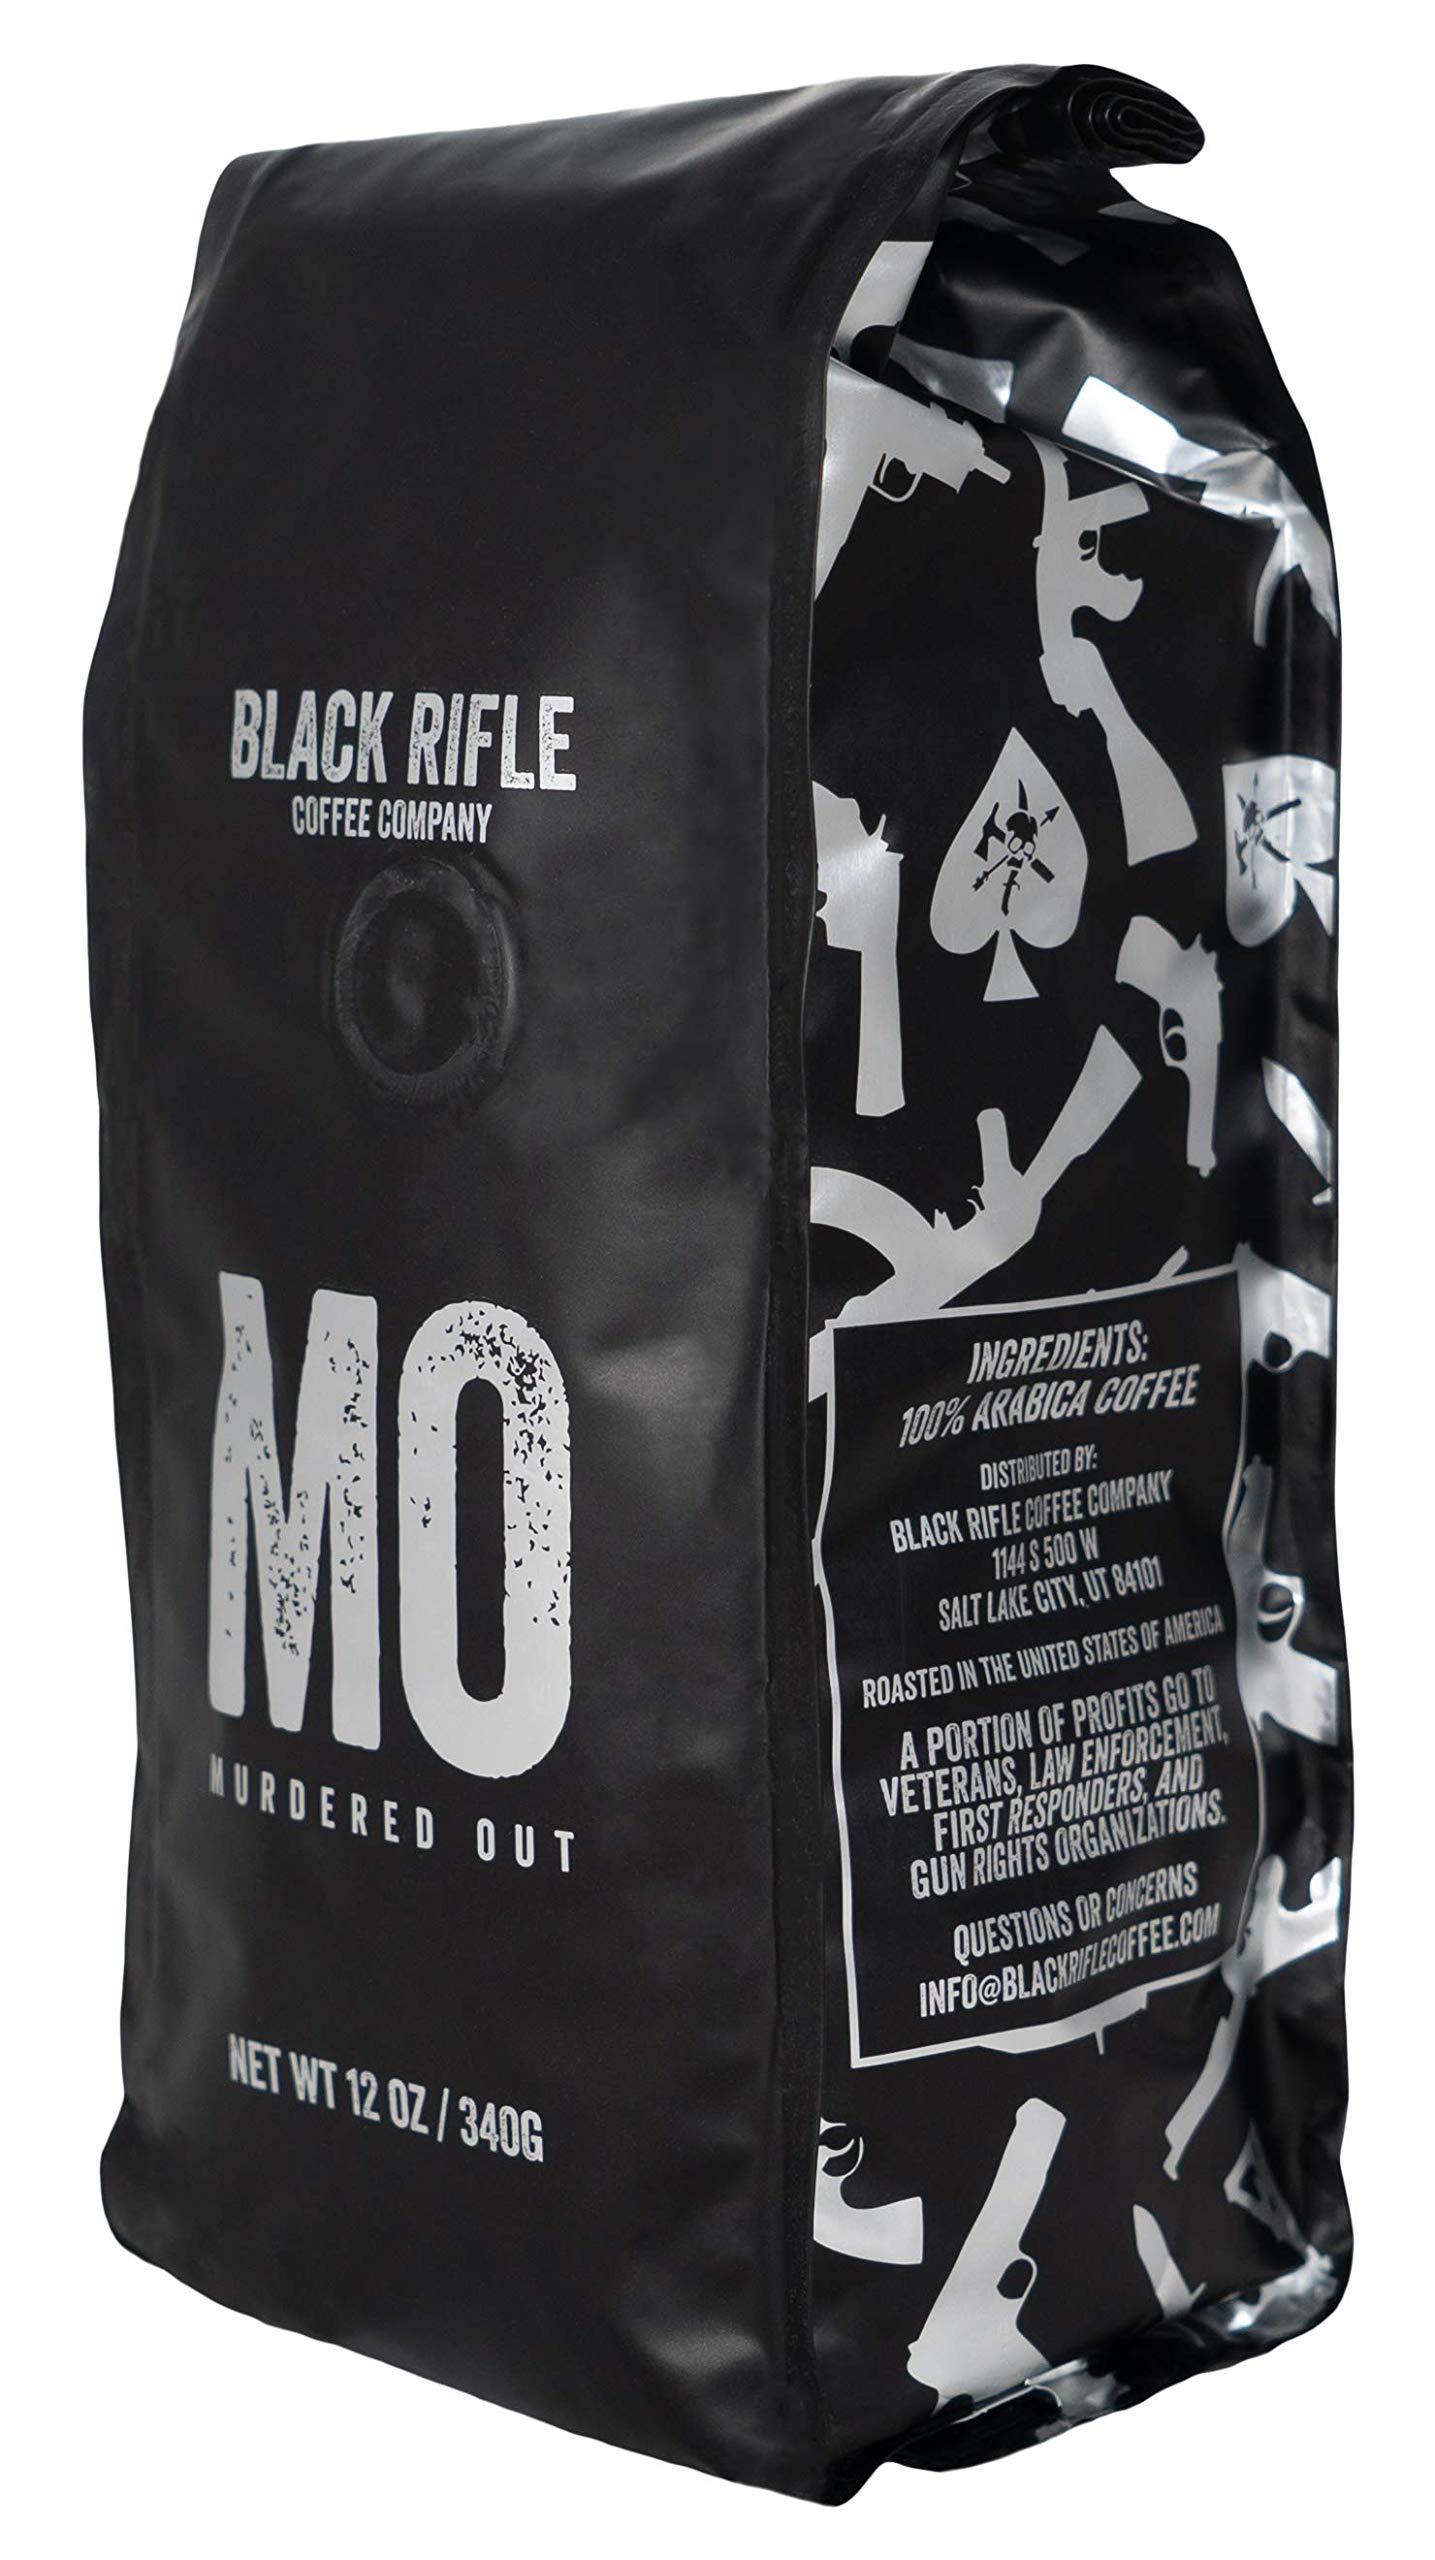 Black Rifle Coffee Company Murdered Out Dark Roast Ground Coffee, 12 Ounce Bag by Black Rifle Coffee Company